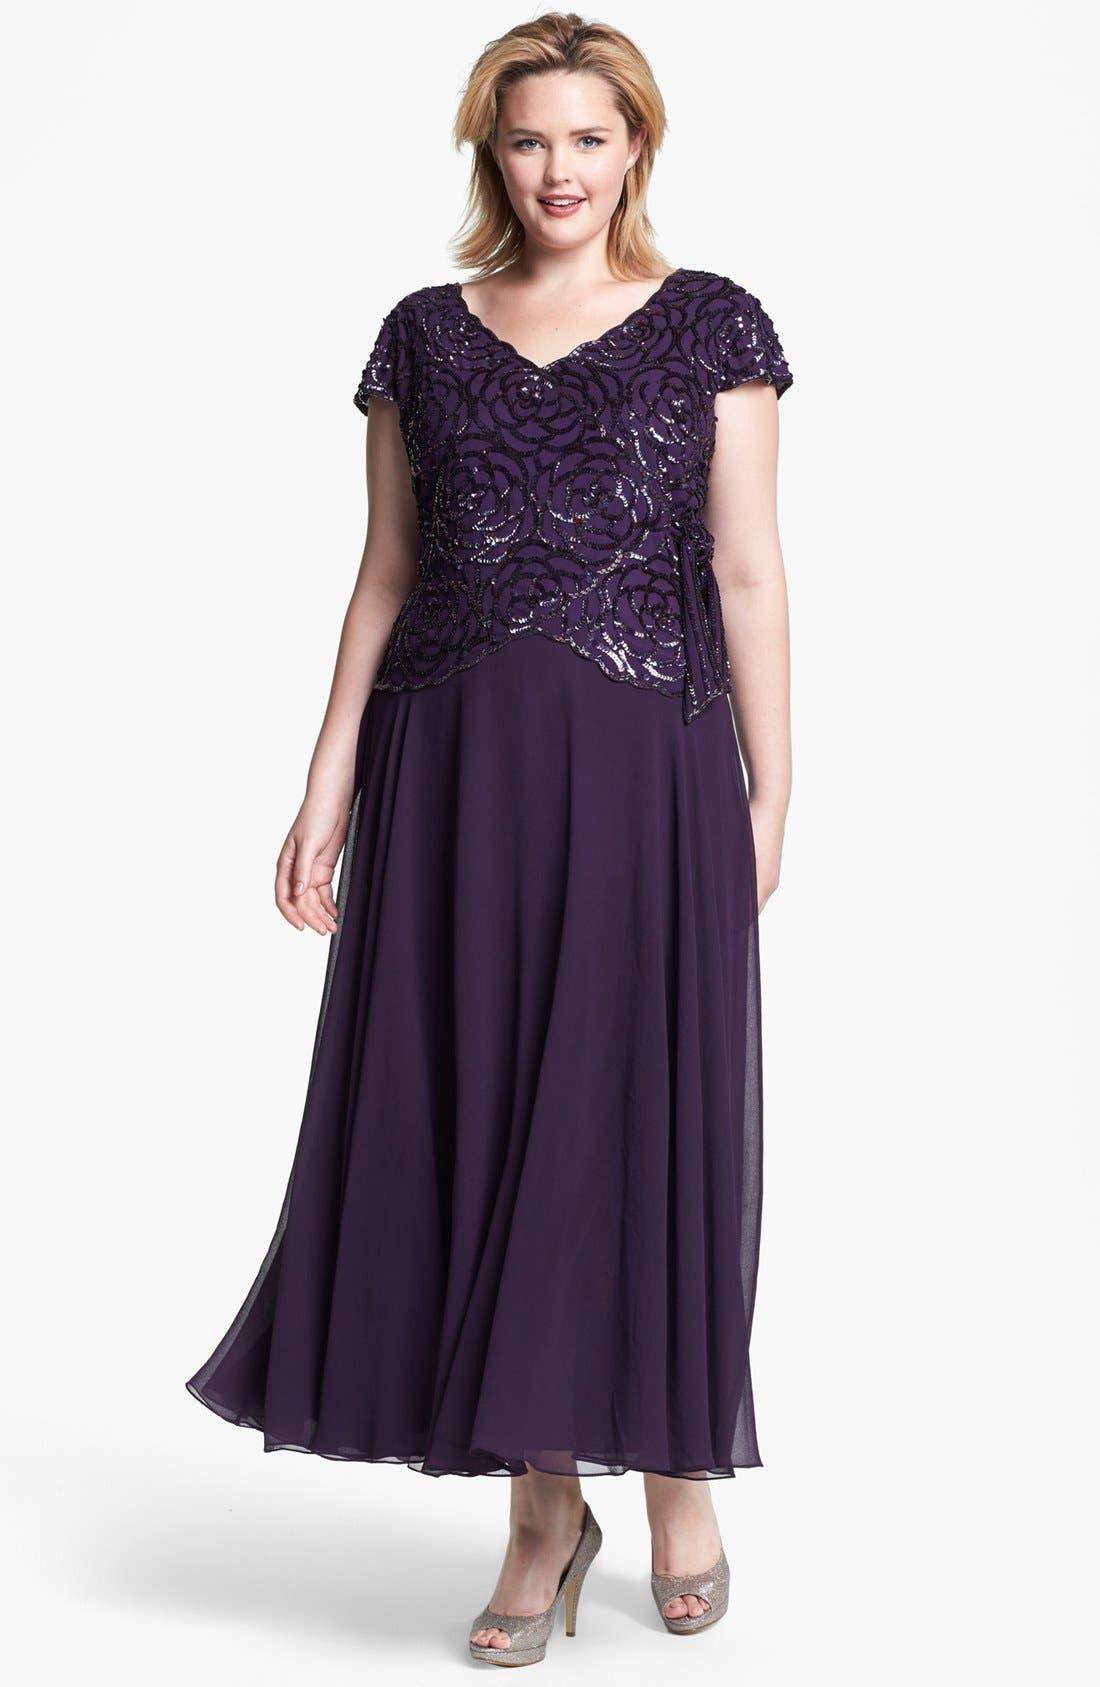 Main Image - J Kara Embellished Mock Two Piece Gown